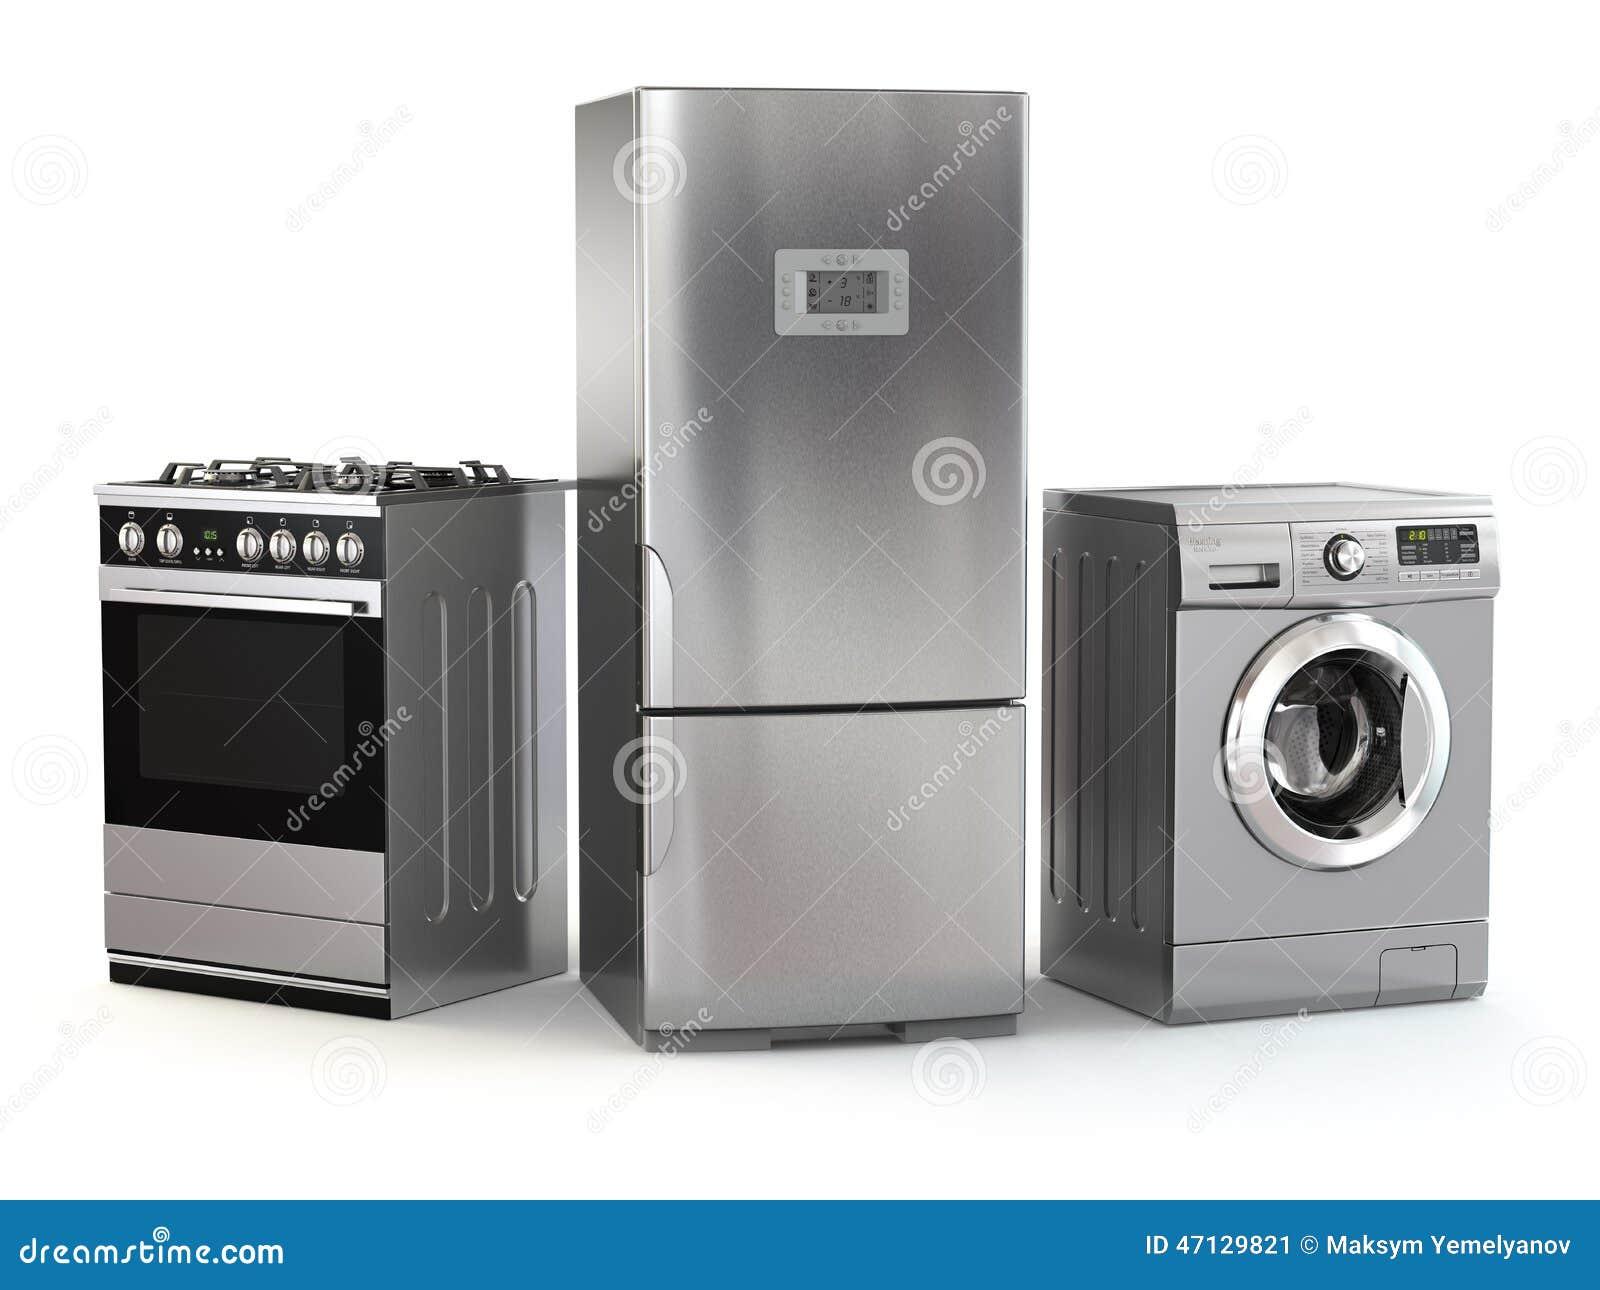 Uncategorized Household Kitchen Appliances home appliances set of household kitchen technics stock illustration